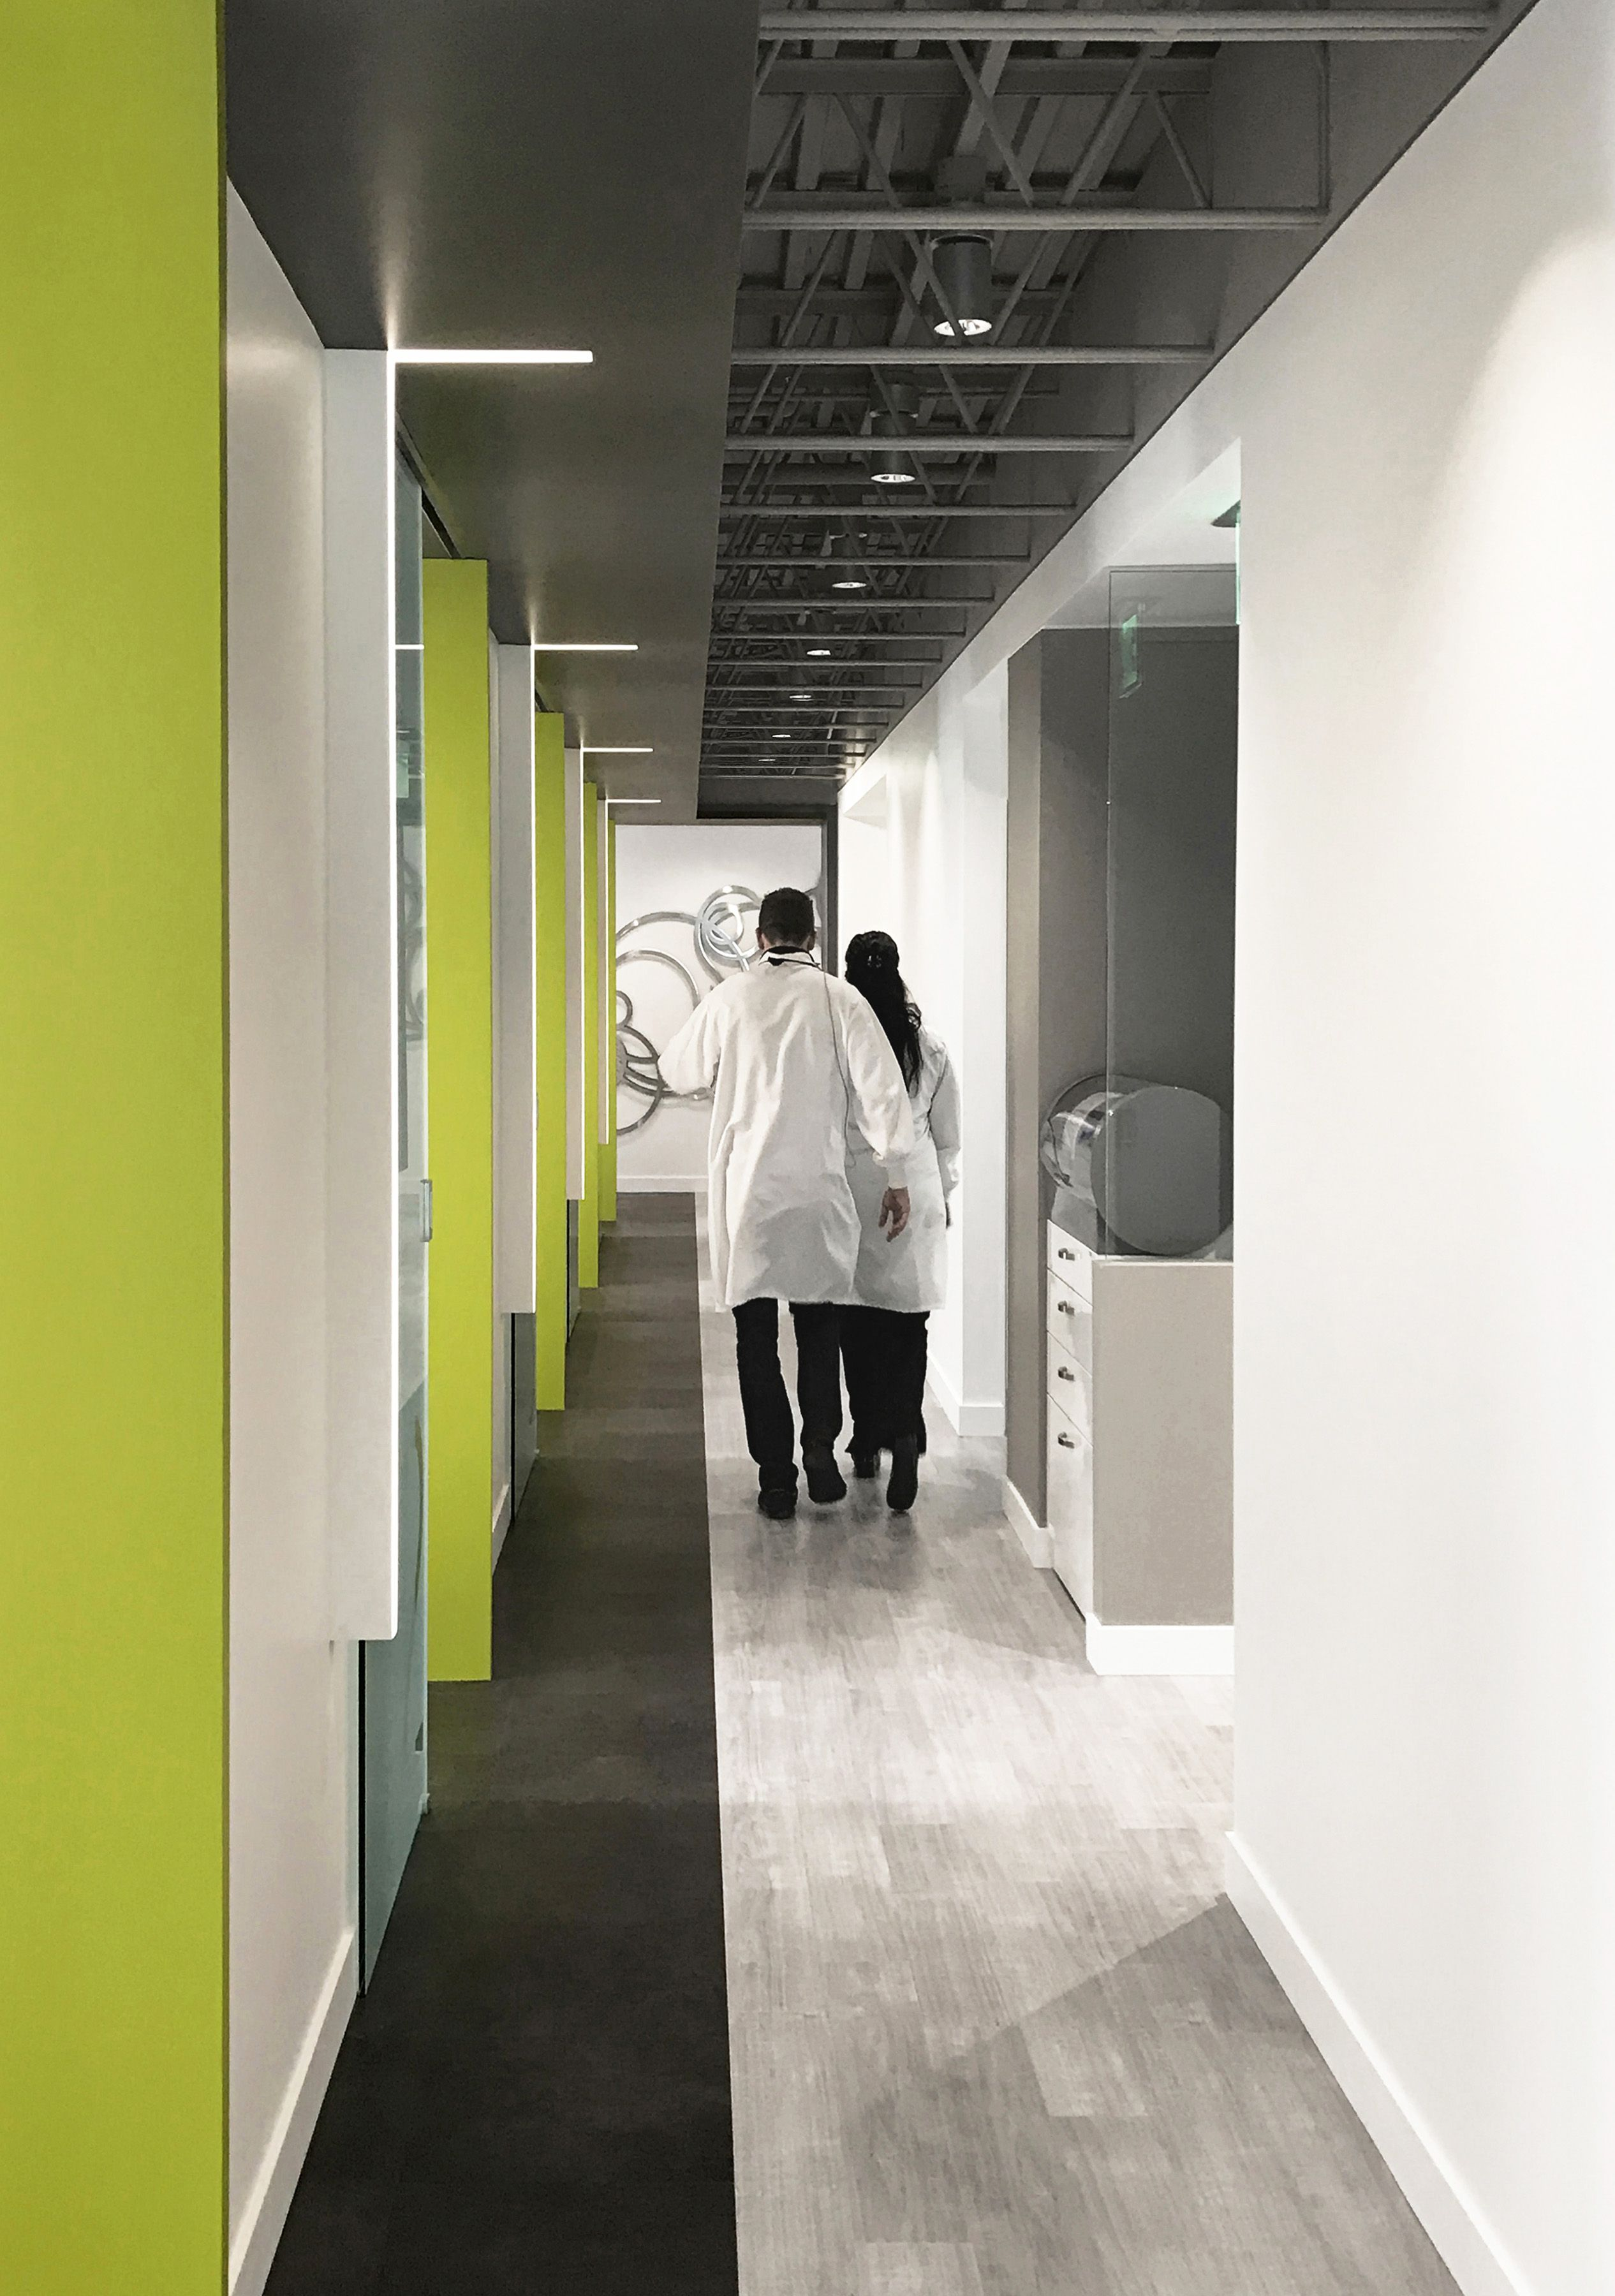 Dental Office Design Competition in 2020 | Dental office ...